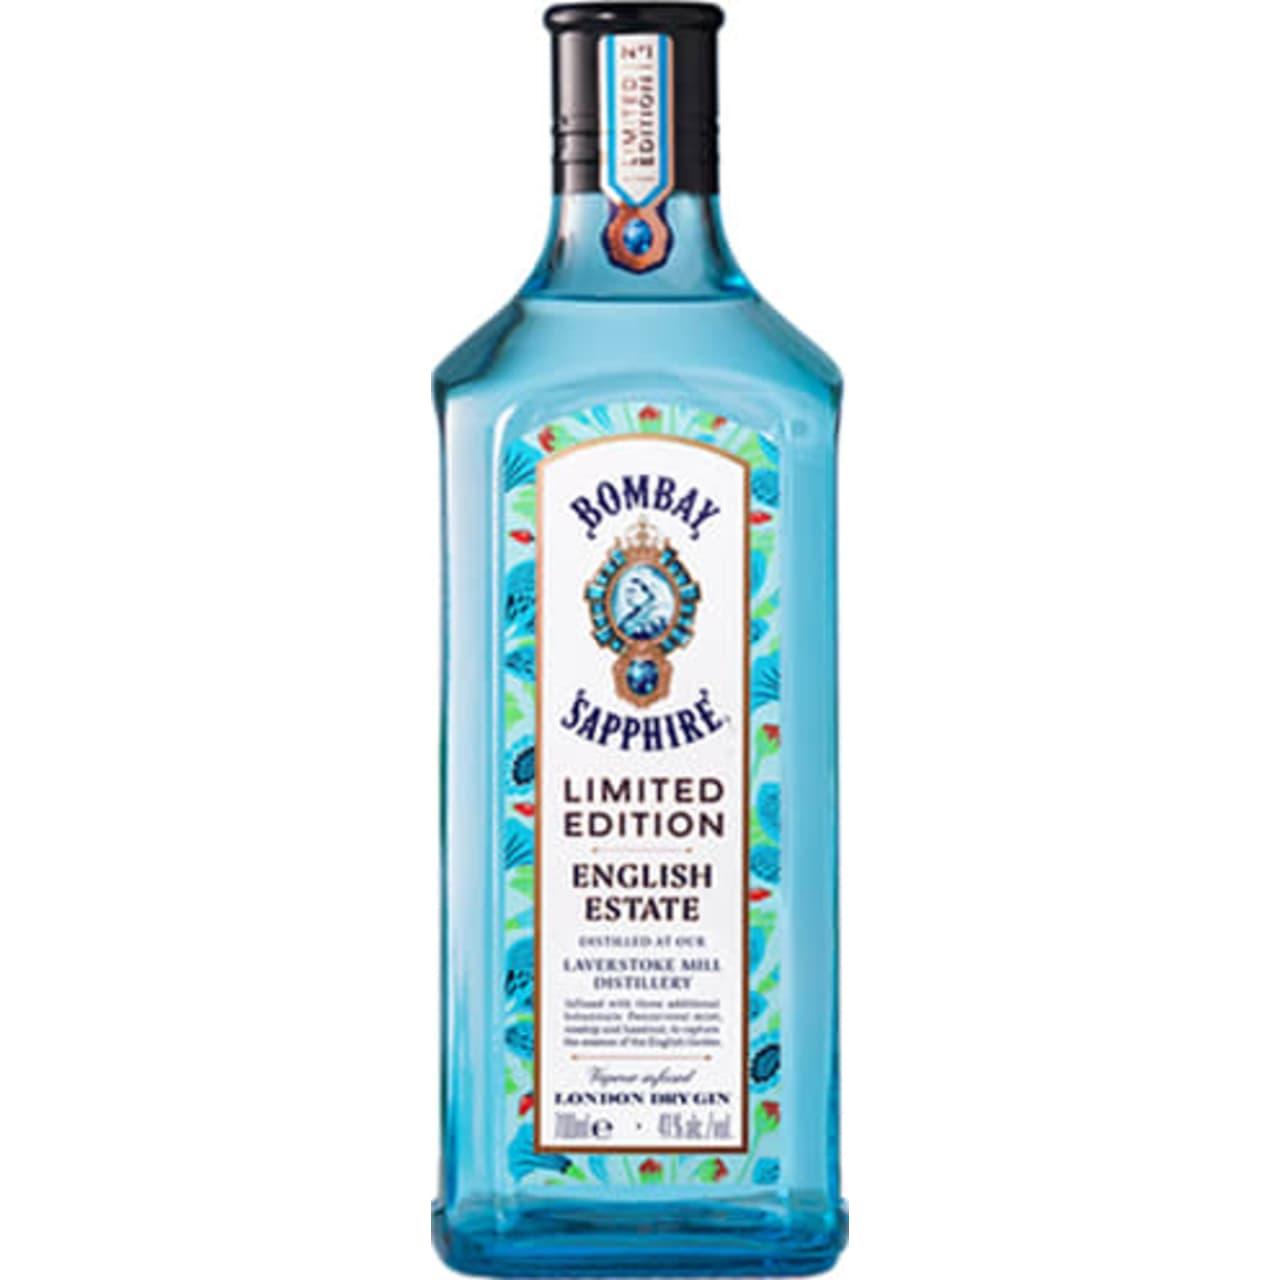 Product Image - Bombay Sapphire English Estate Gin